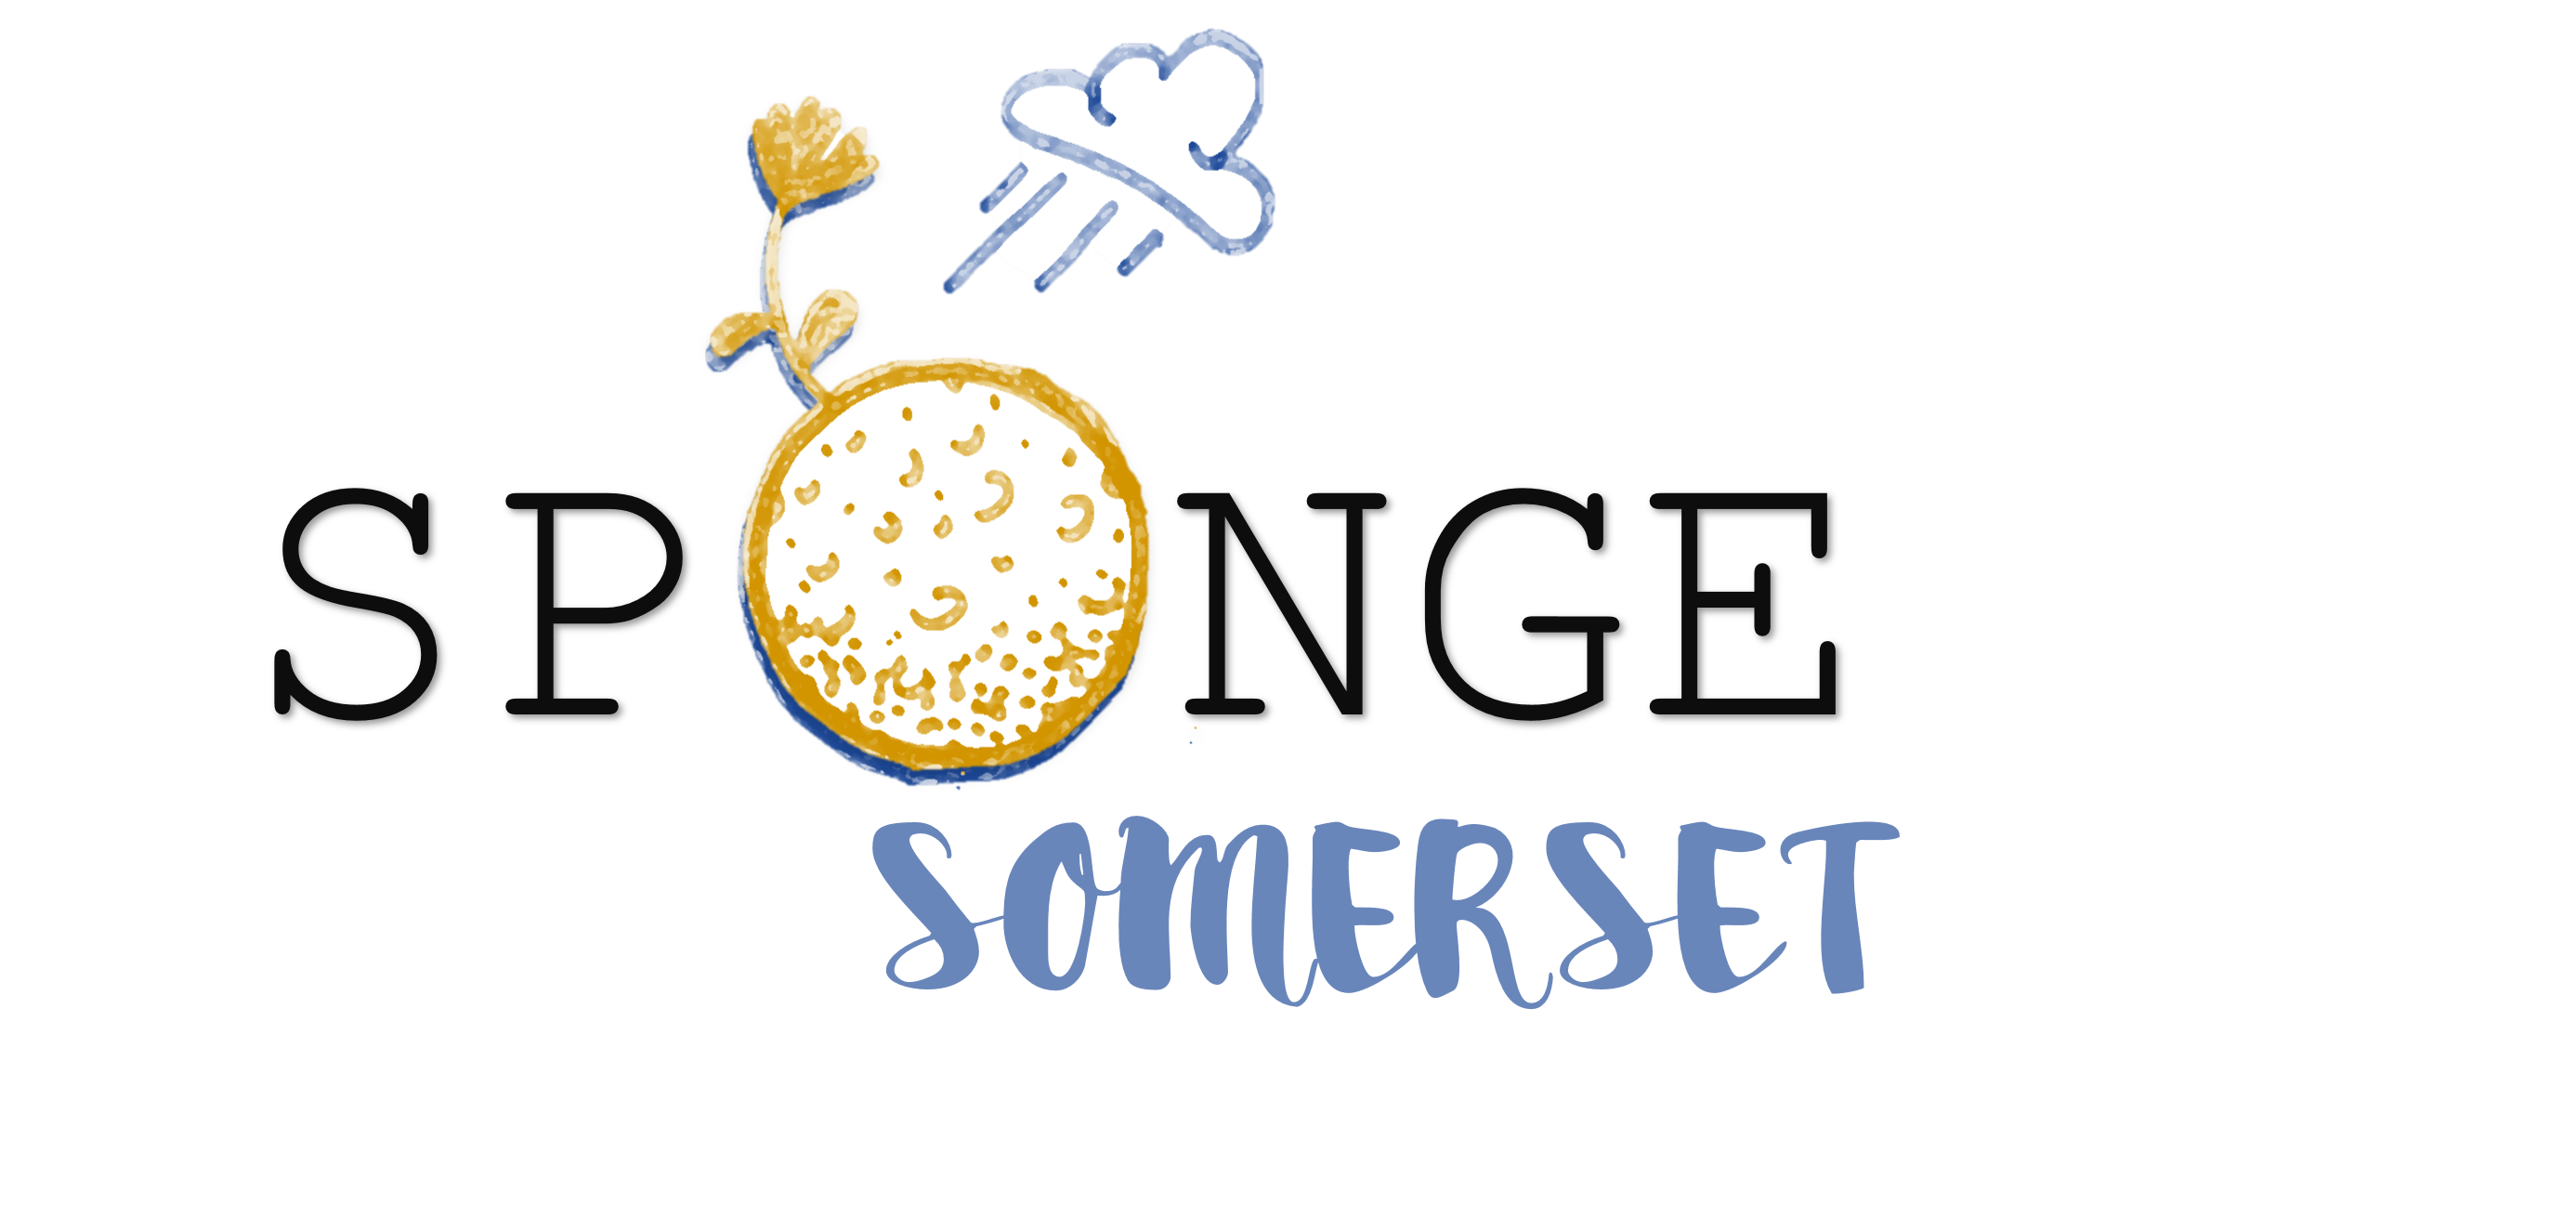 Sponge - Somerset